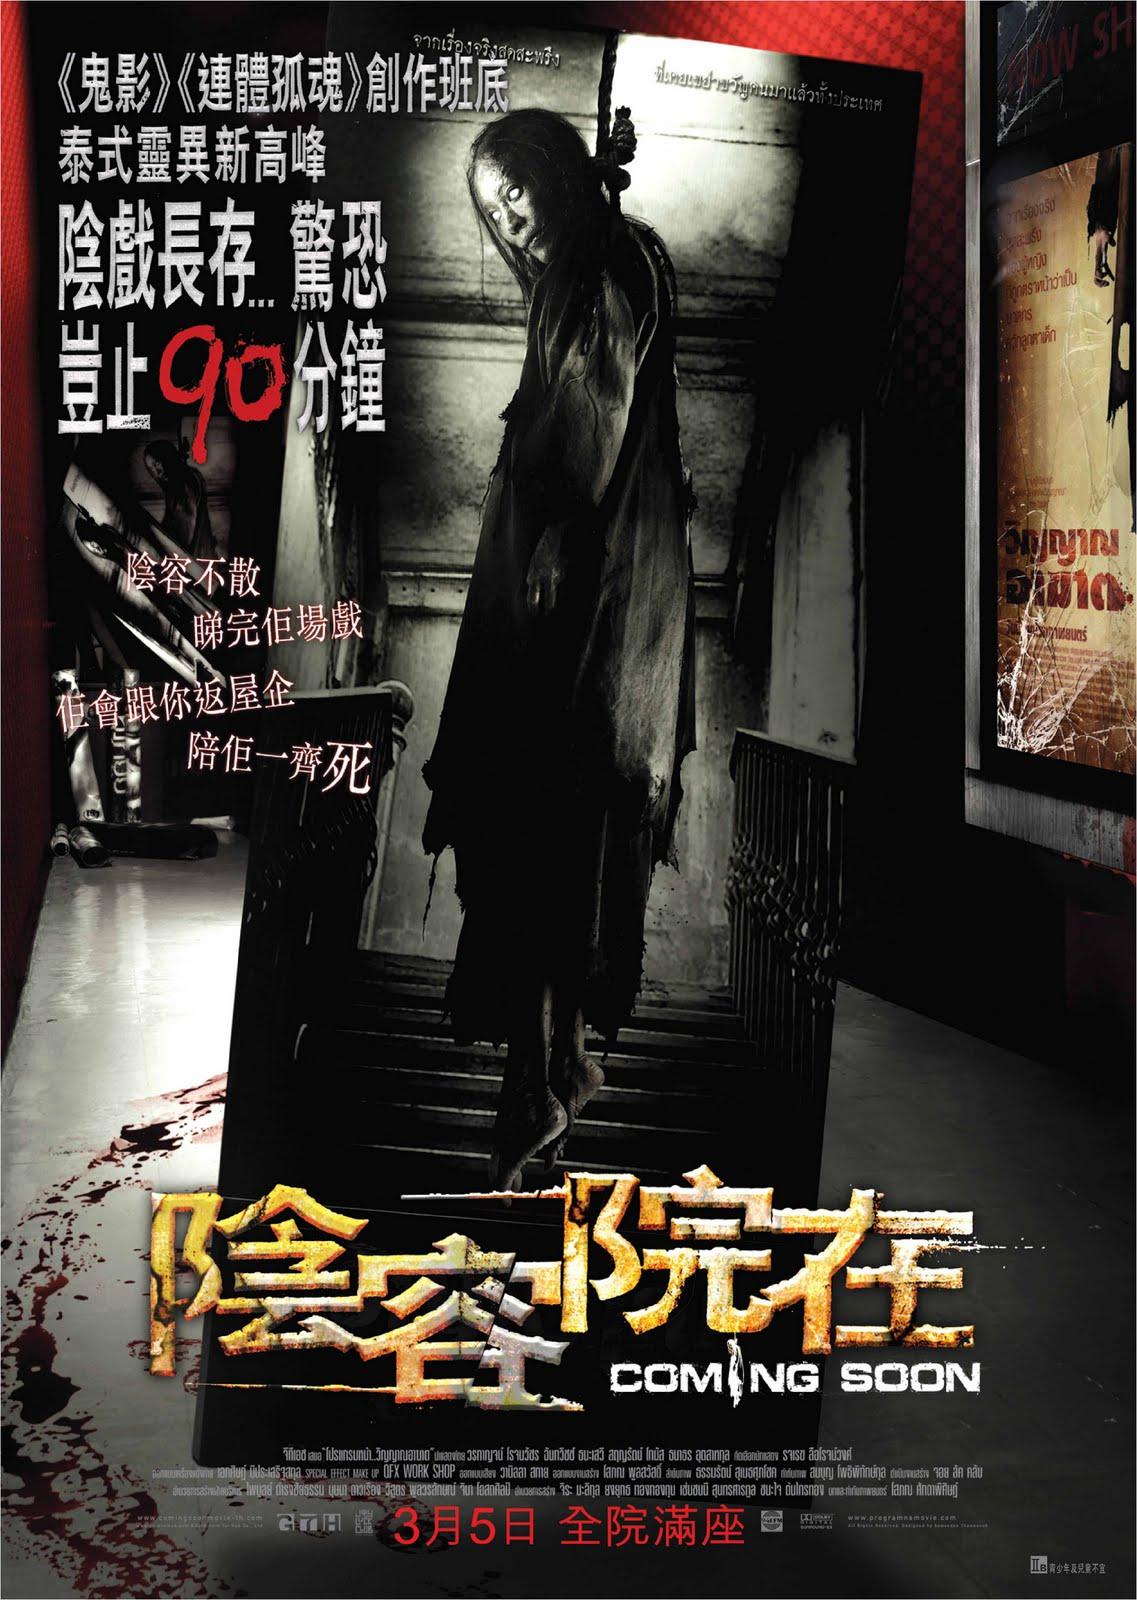 coming soon thailand horror wenglish sub free movies 247